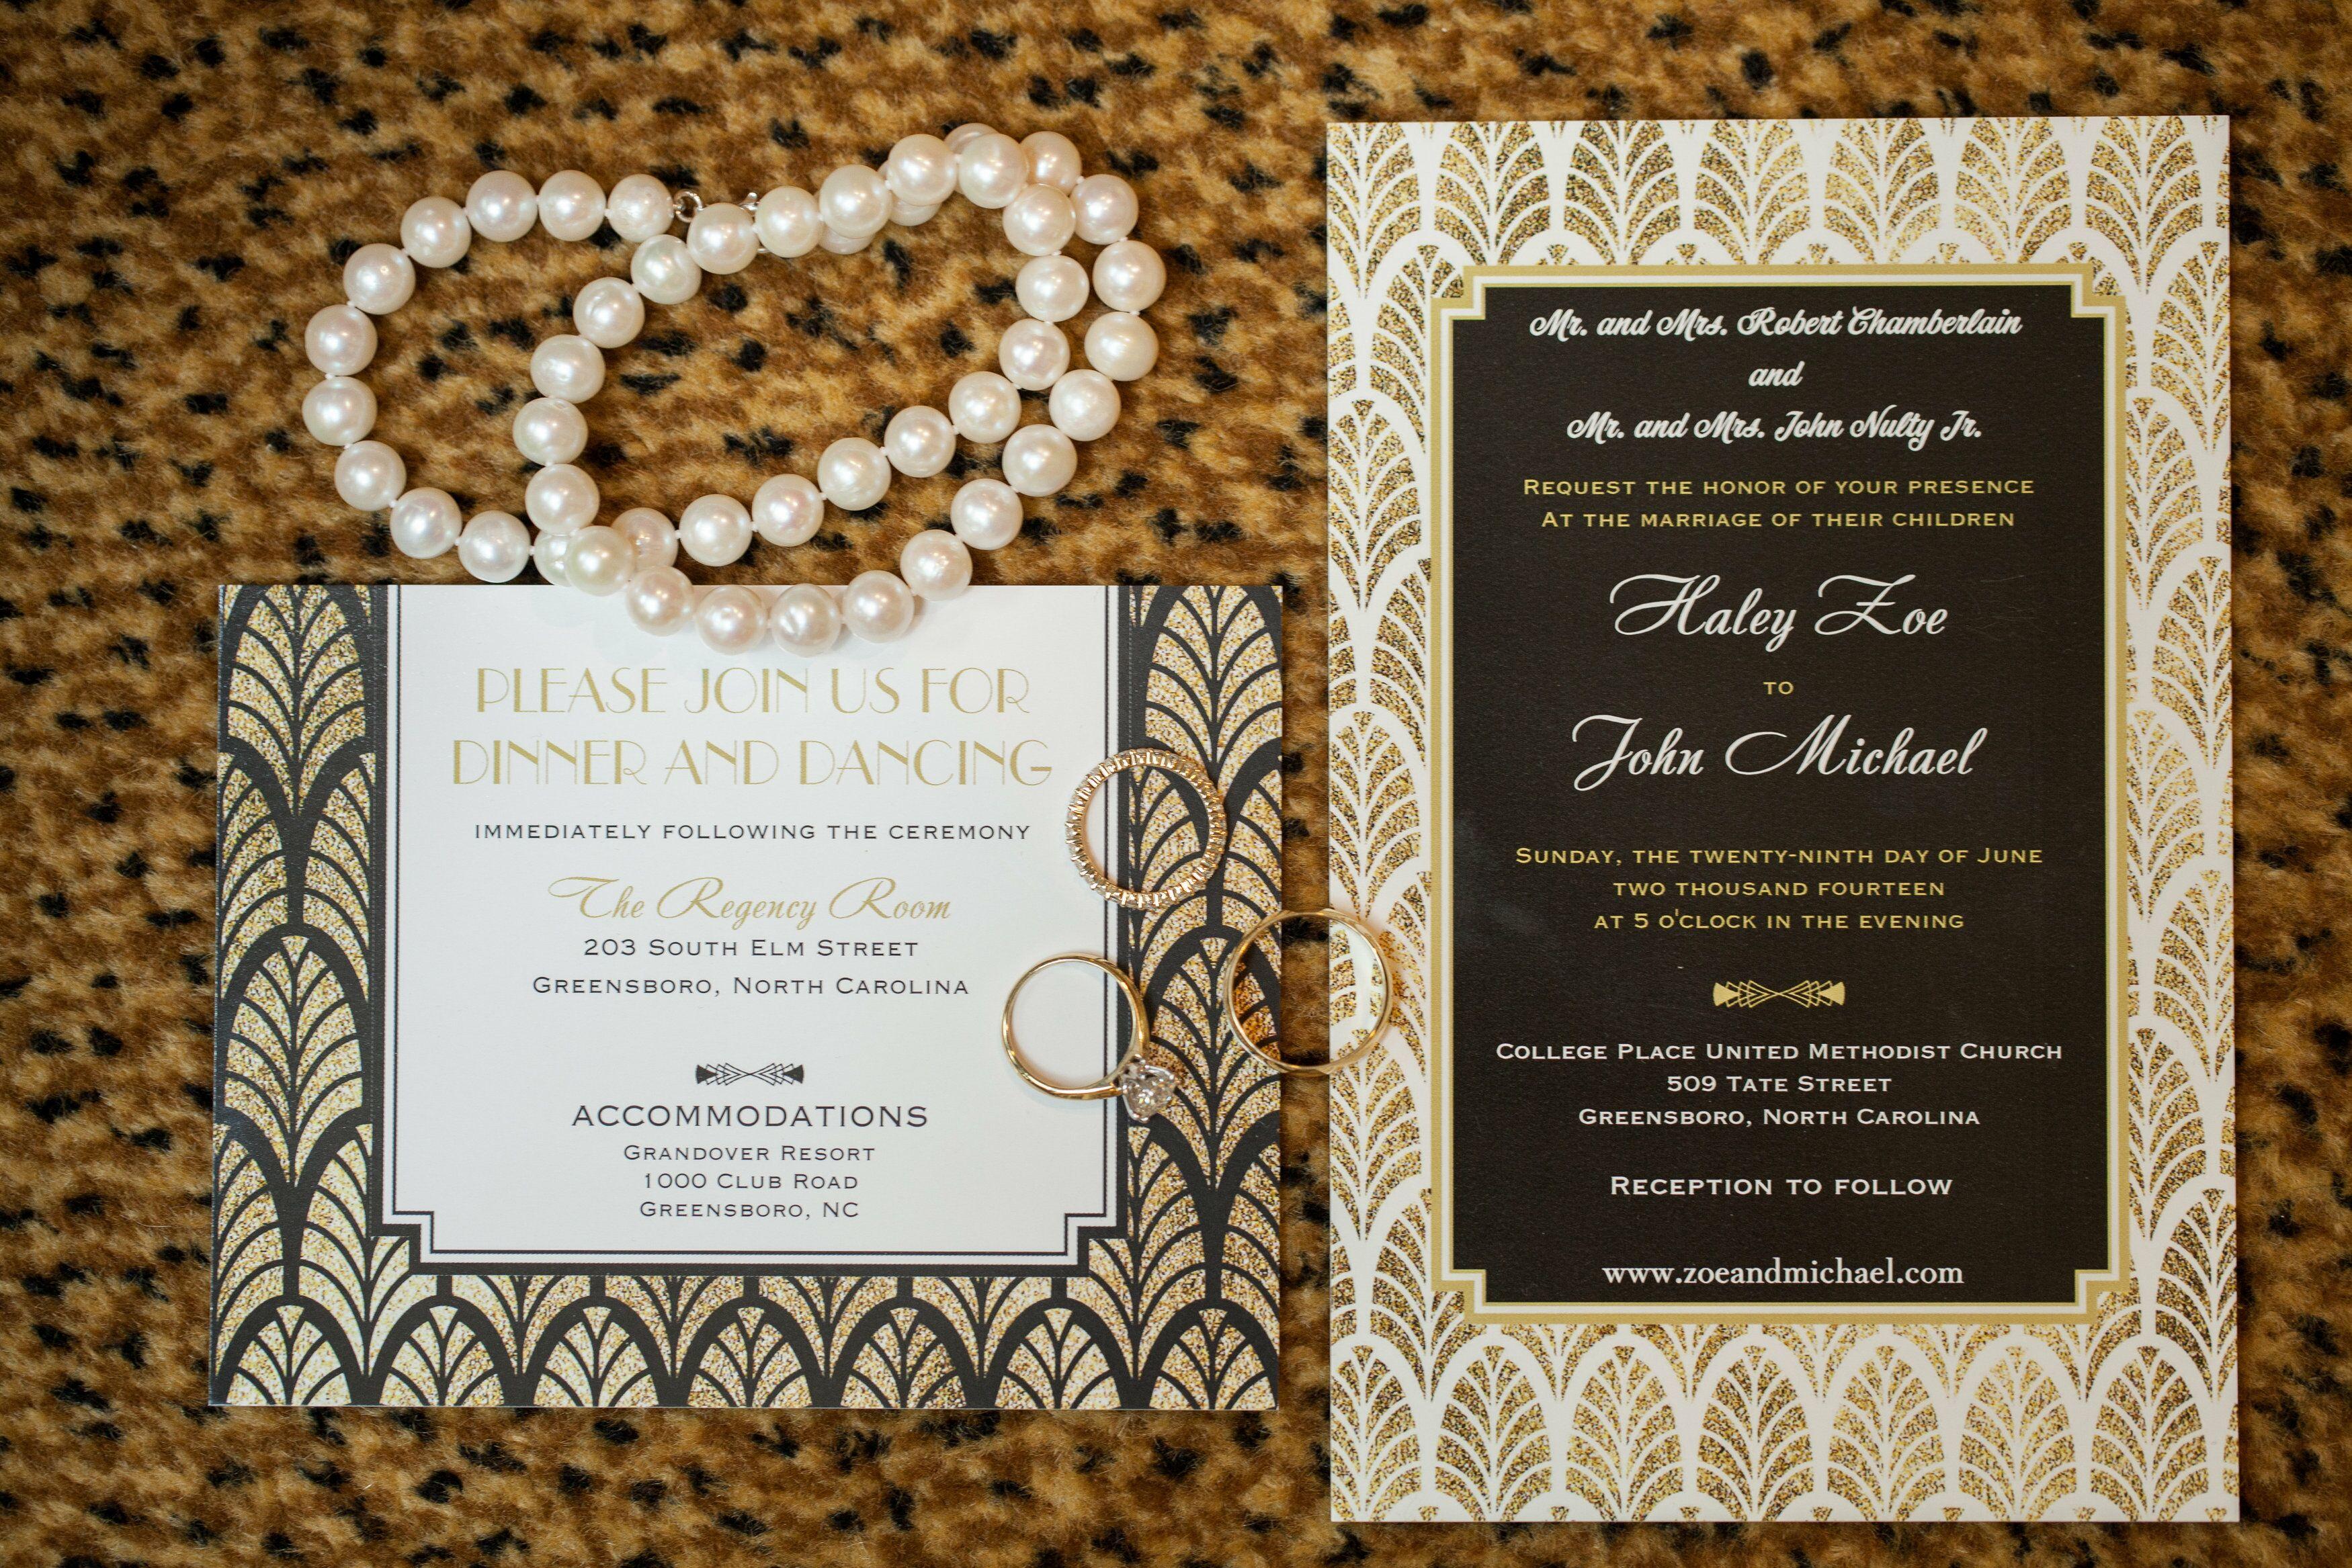 Deco Wedding Invitations: Art Deco-Inspired Wedding Invitations